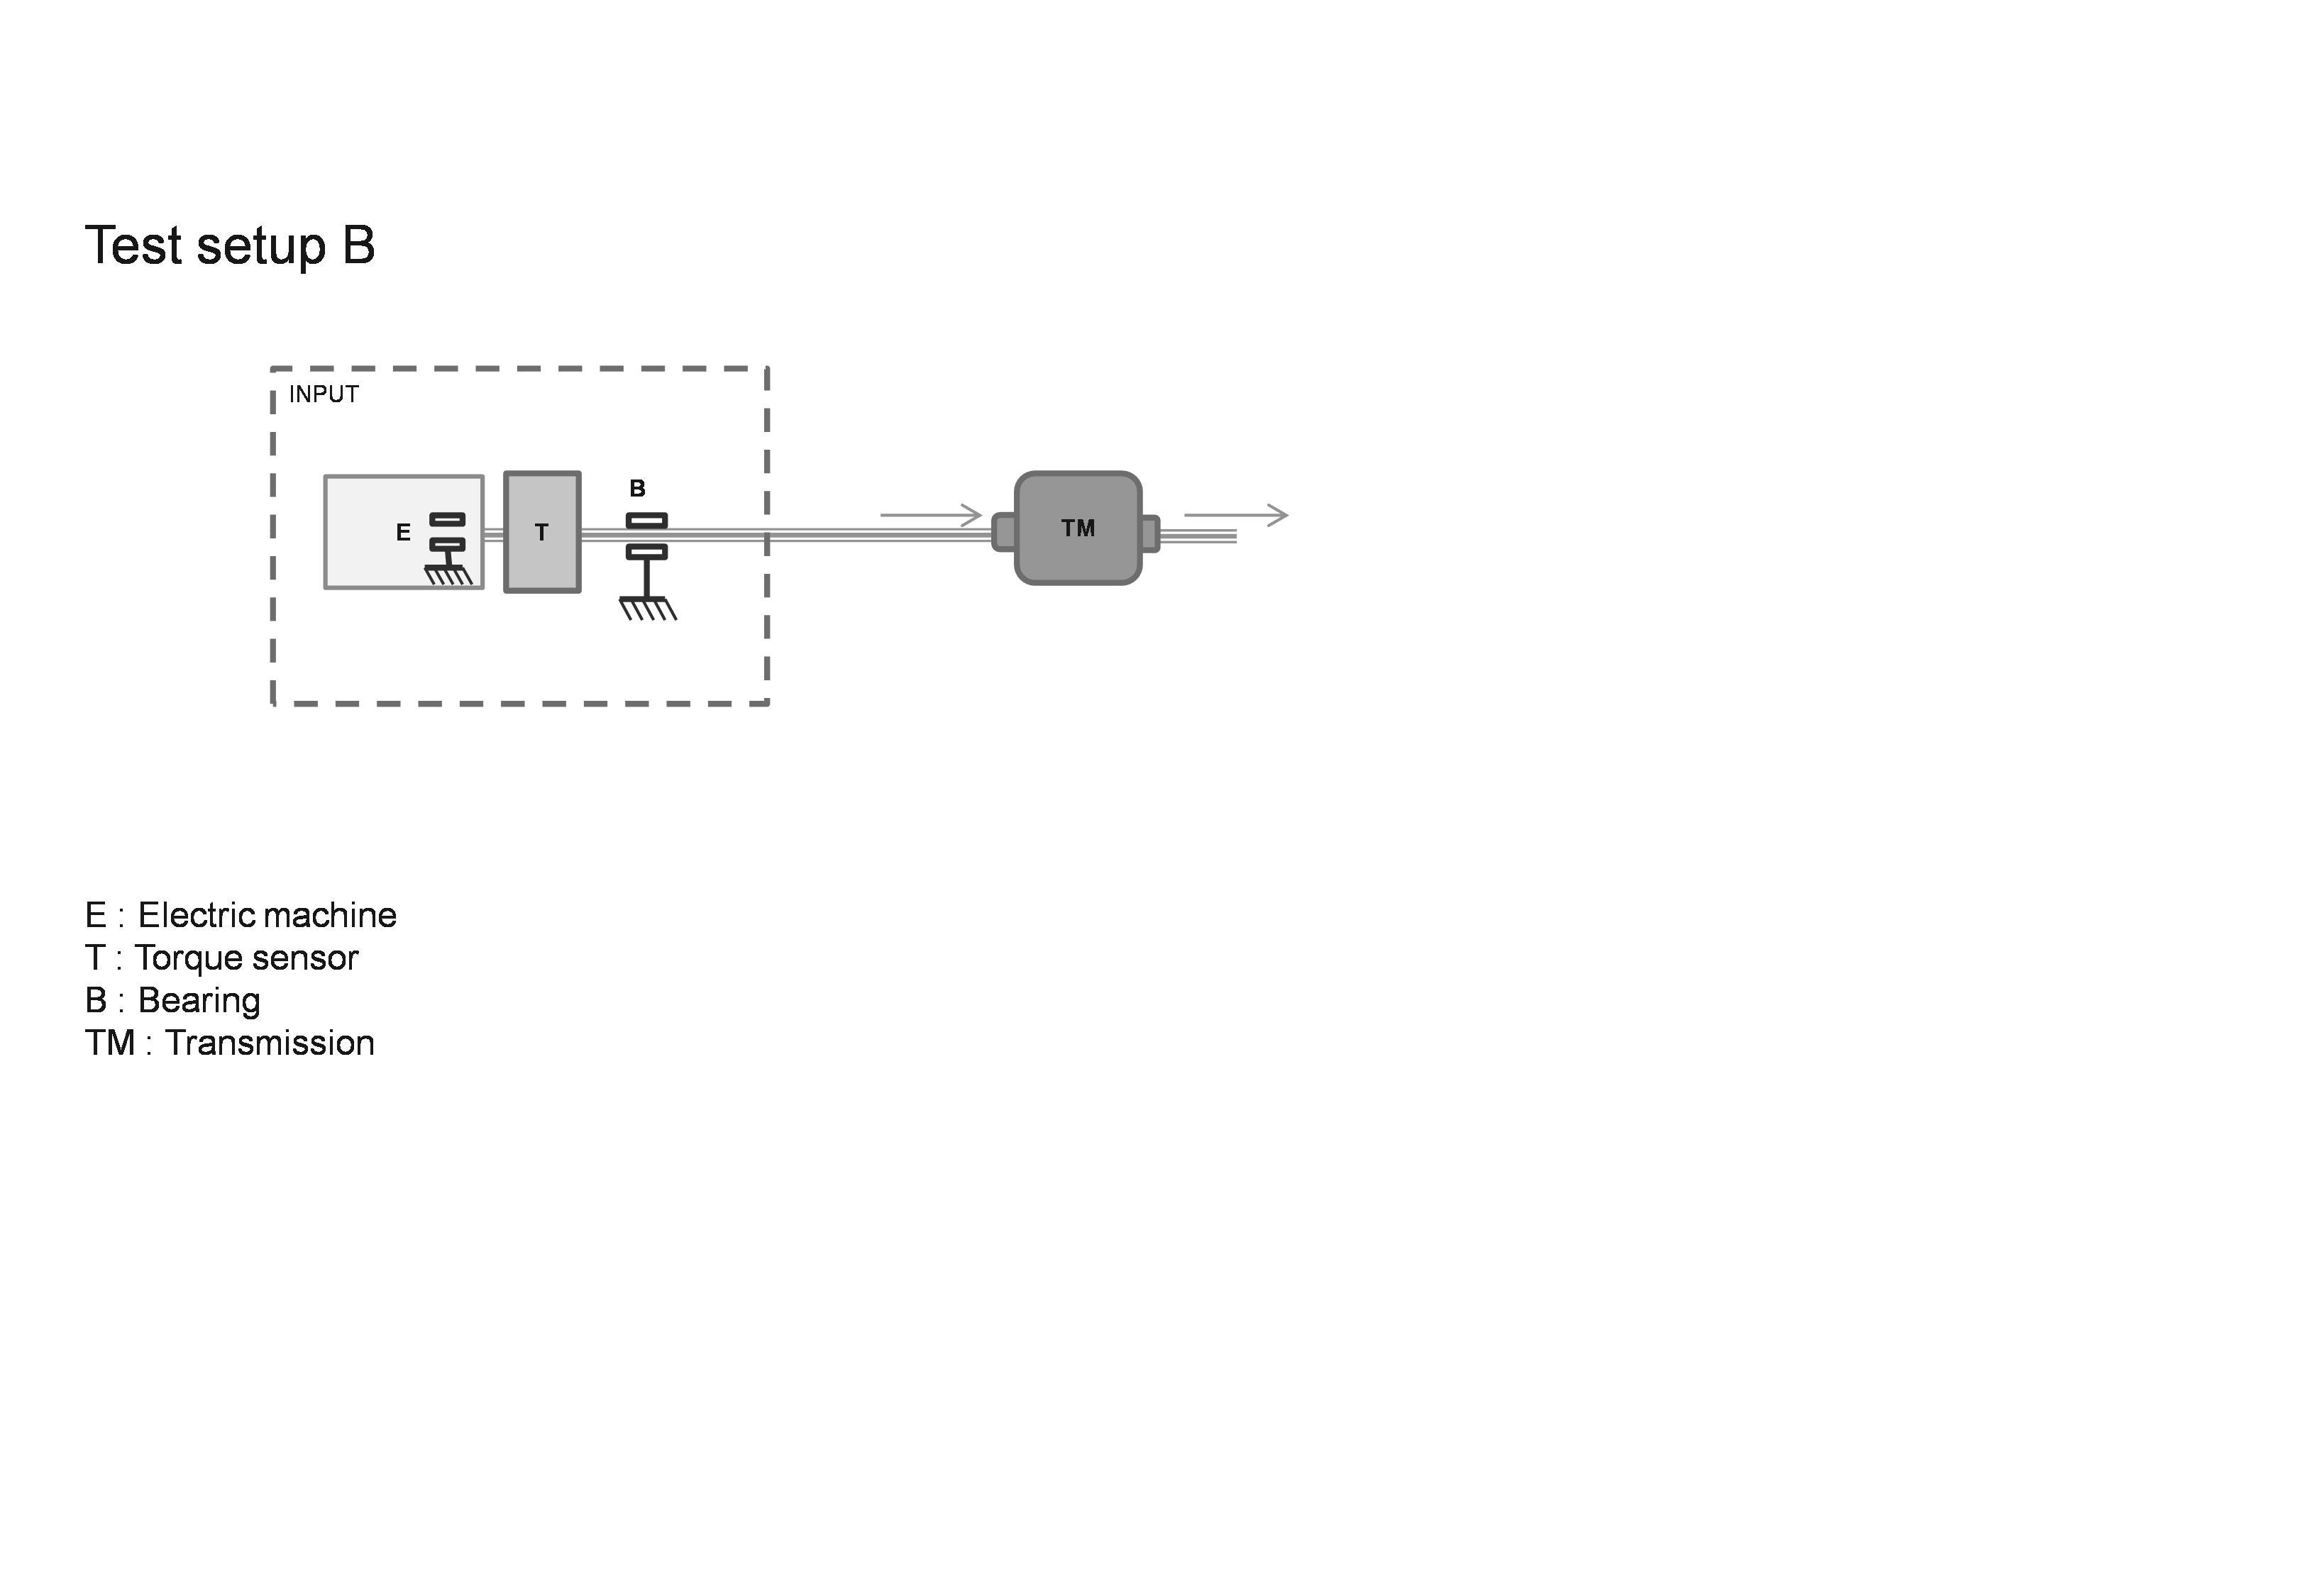 Eur Lex Ares20171900557 En List Of 7400 Series Integrated Circuits Figure 2 Test Setup B For Option 1